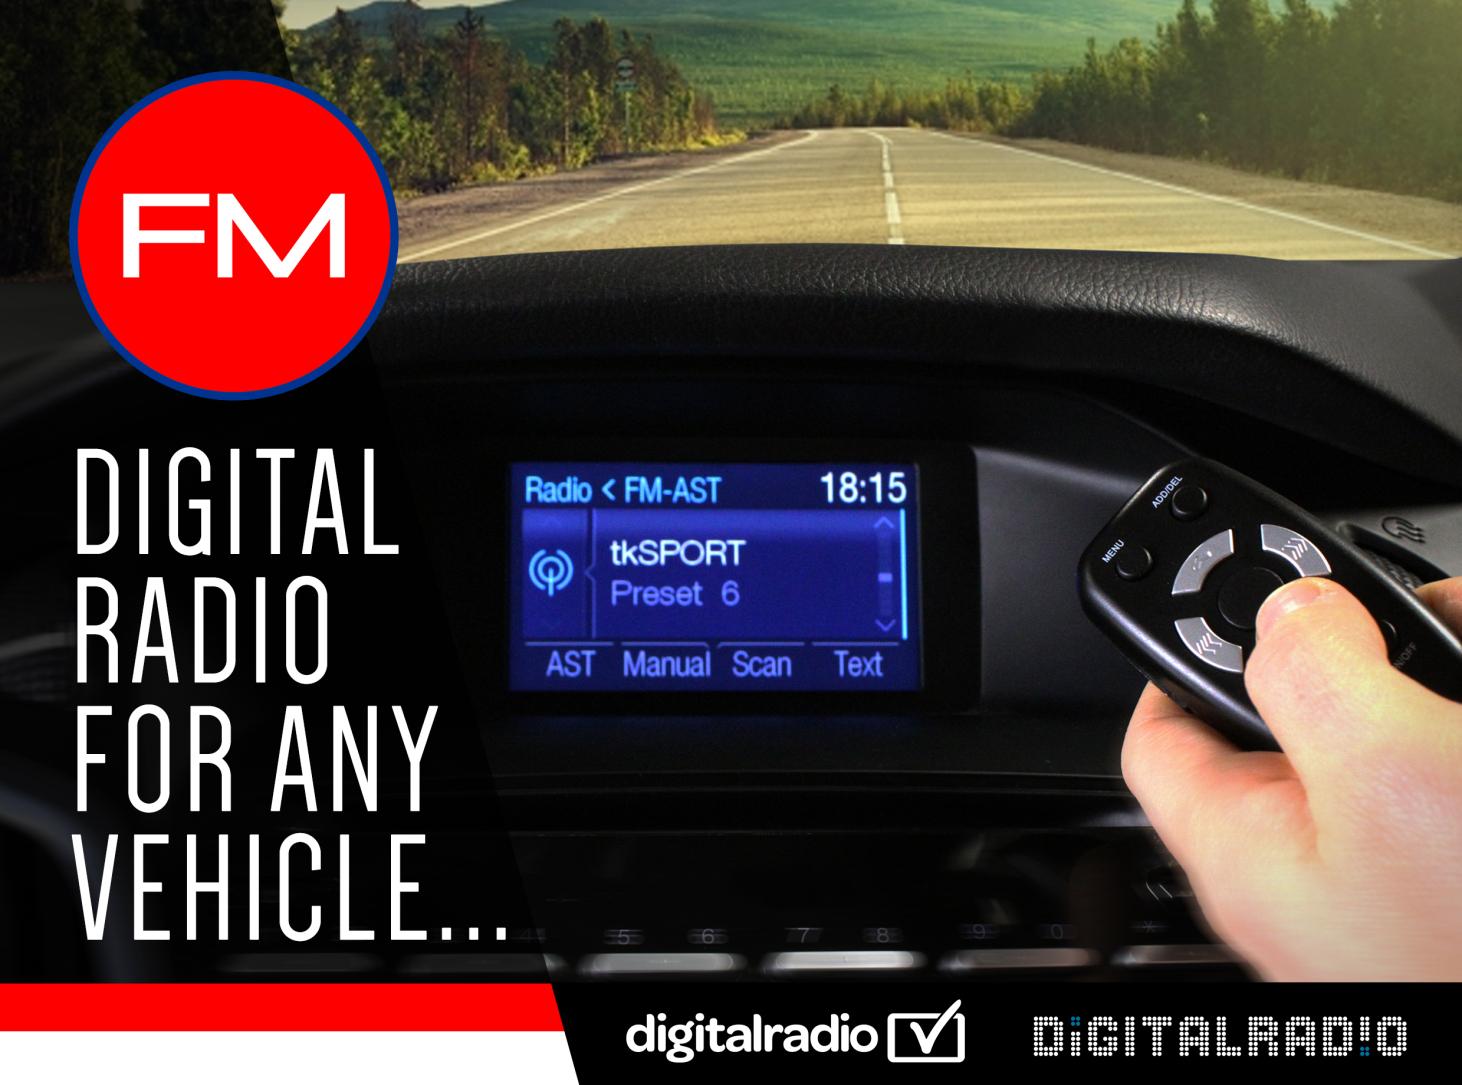 AutoDAB-FM Digital Radio For Any Vehicle